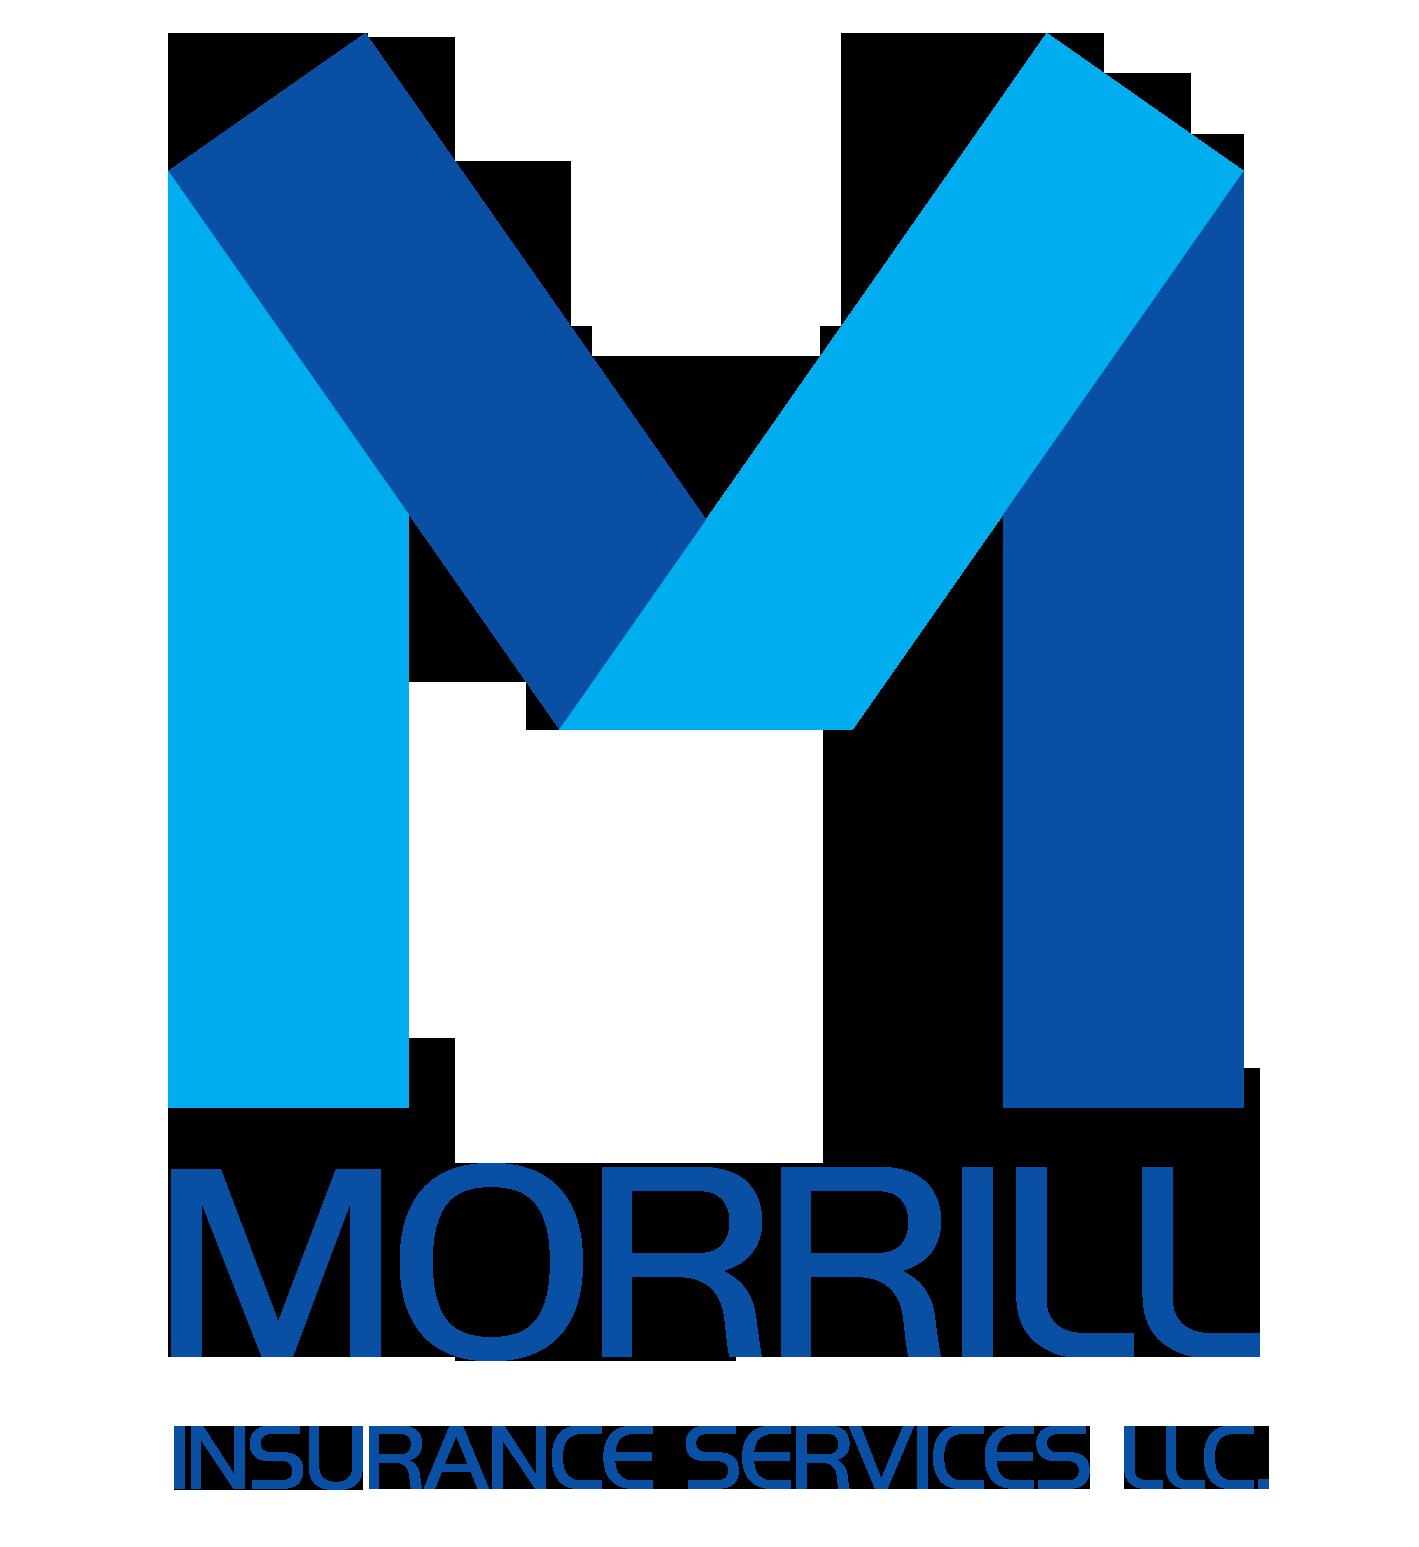 Morrill Insurance Services LLC